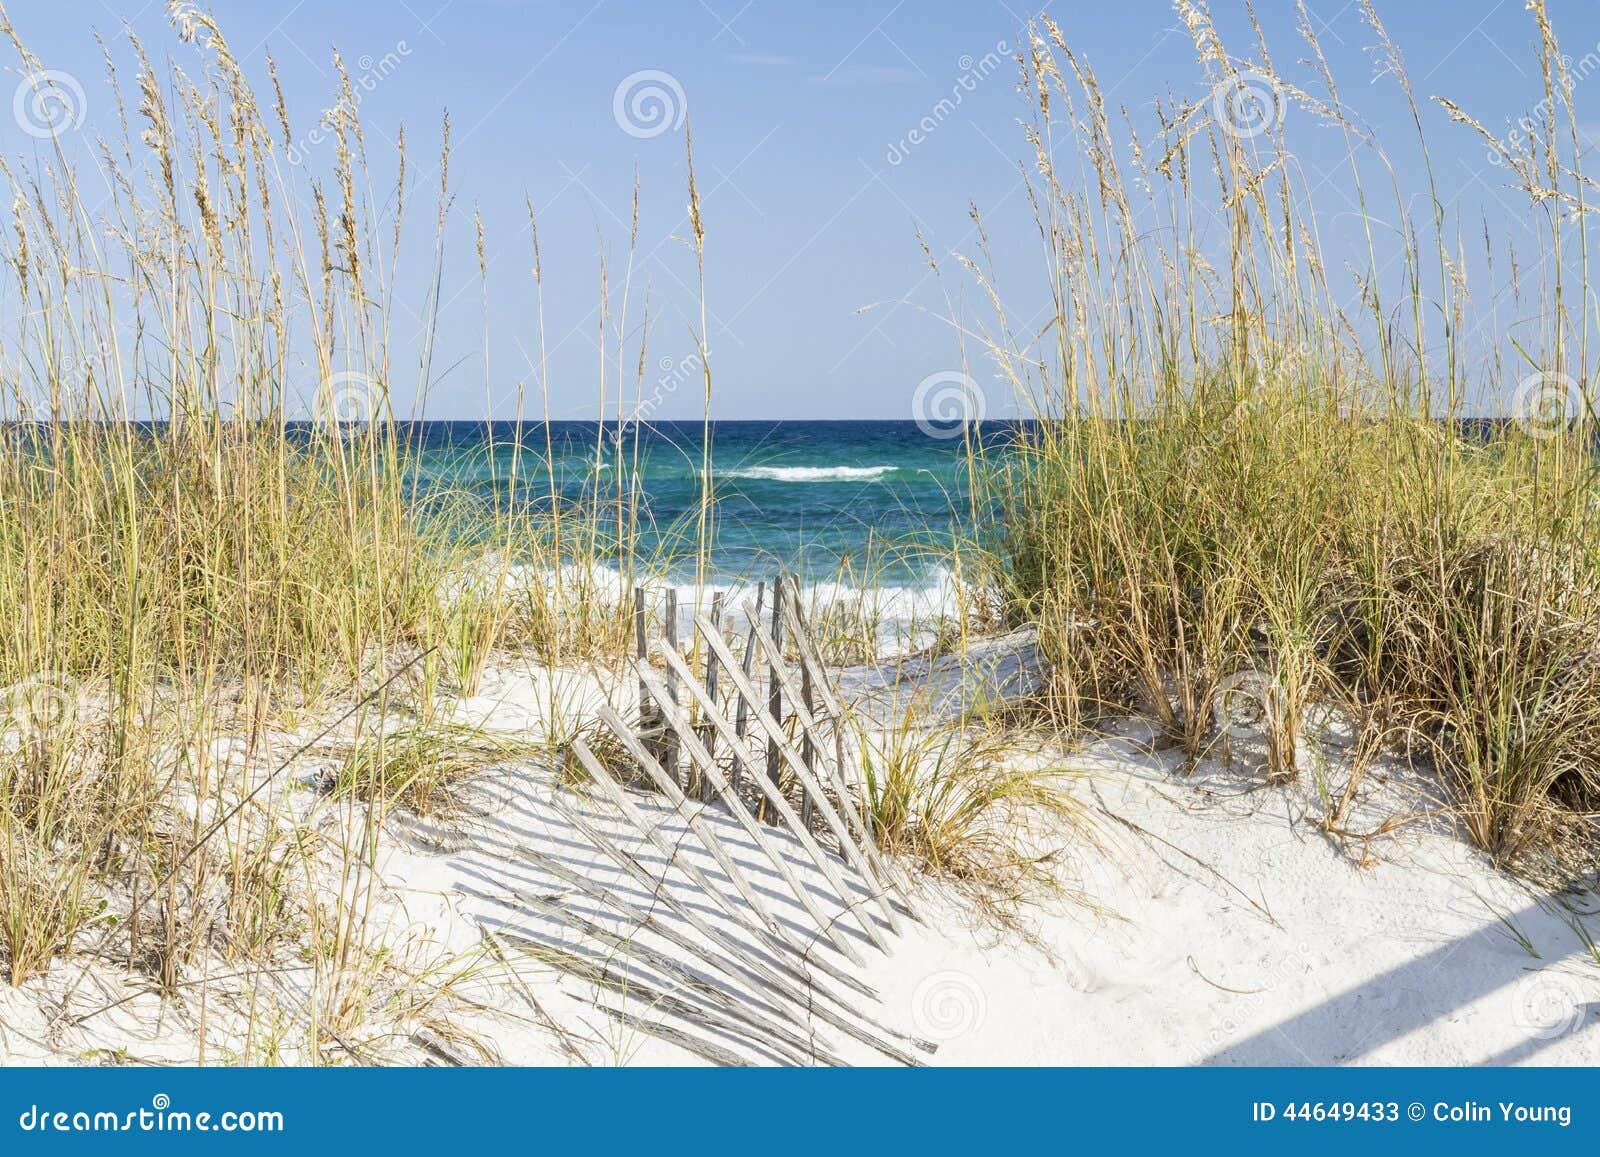 Pensacola Beach Sand Dune Islands